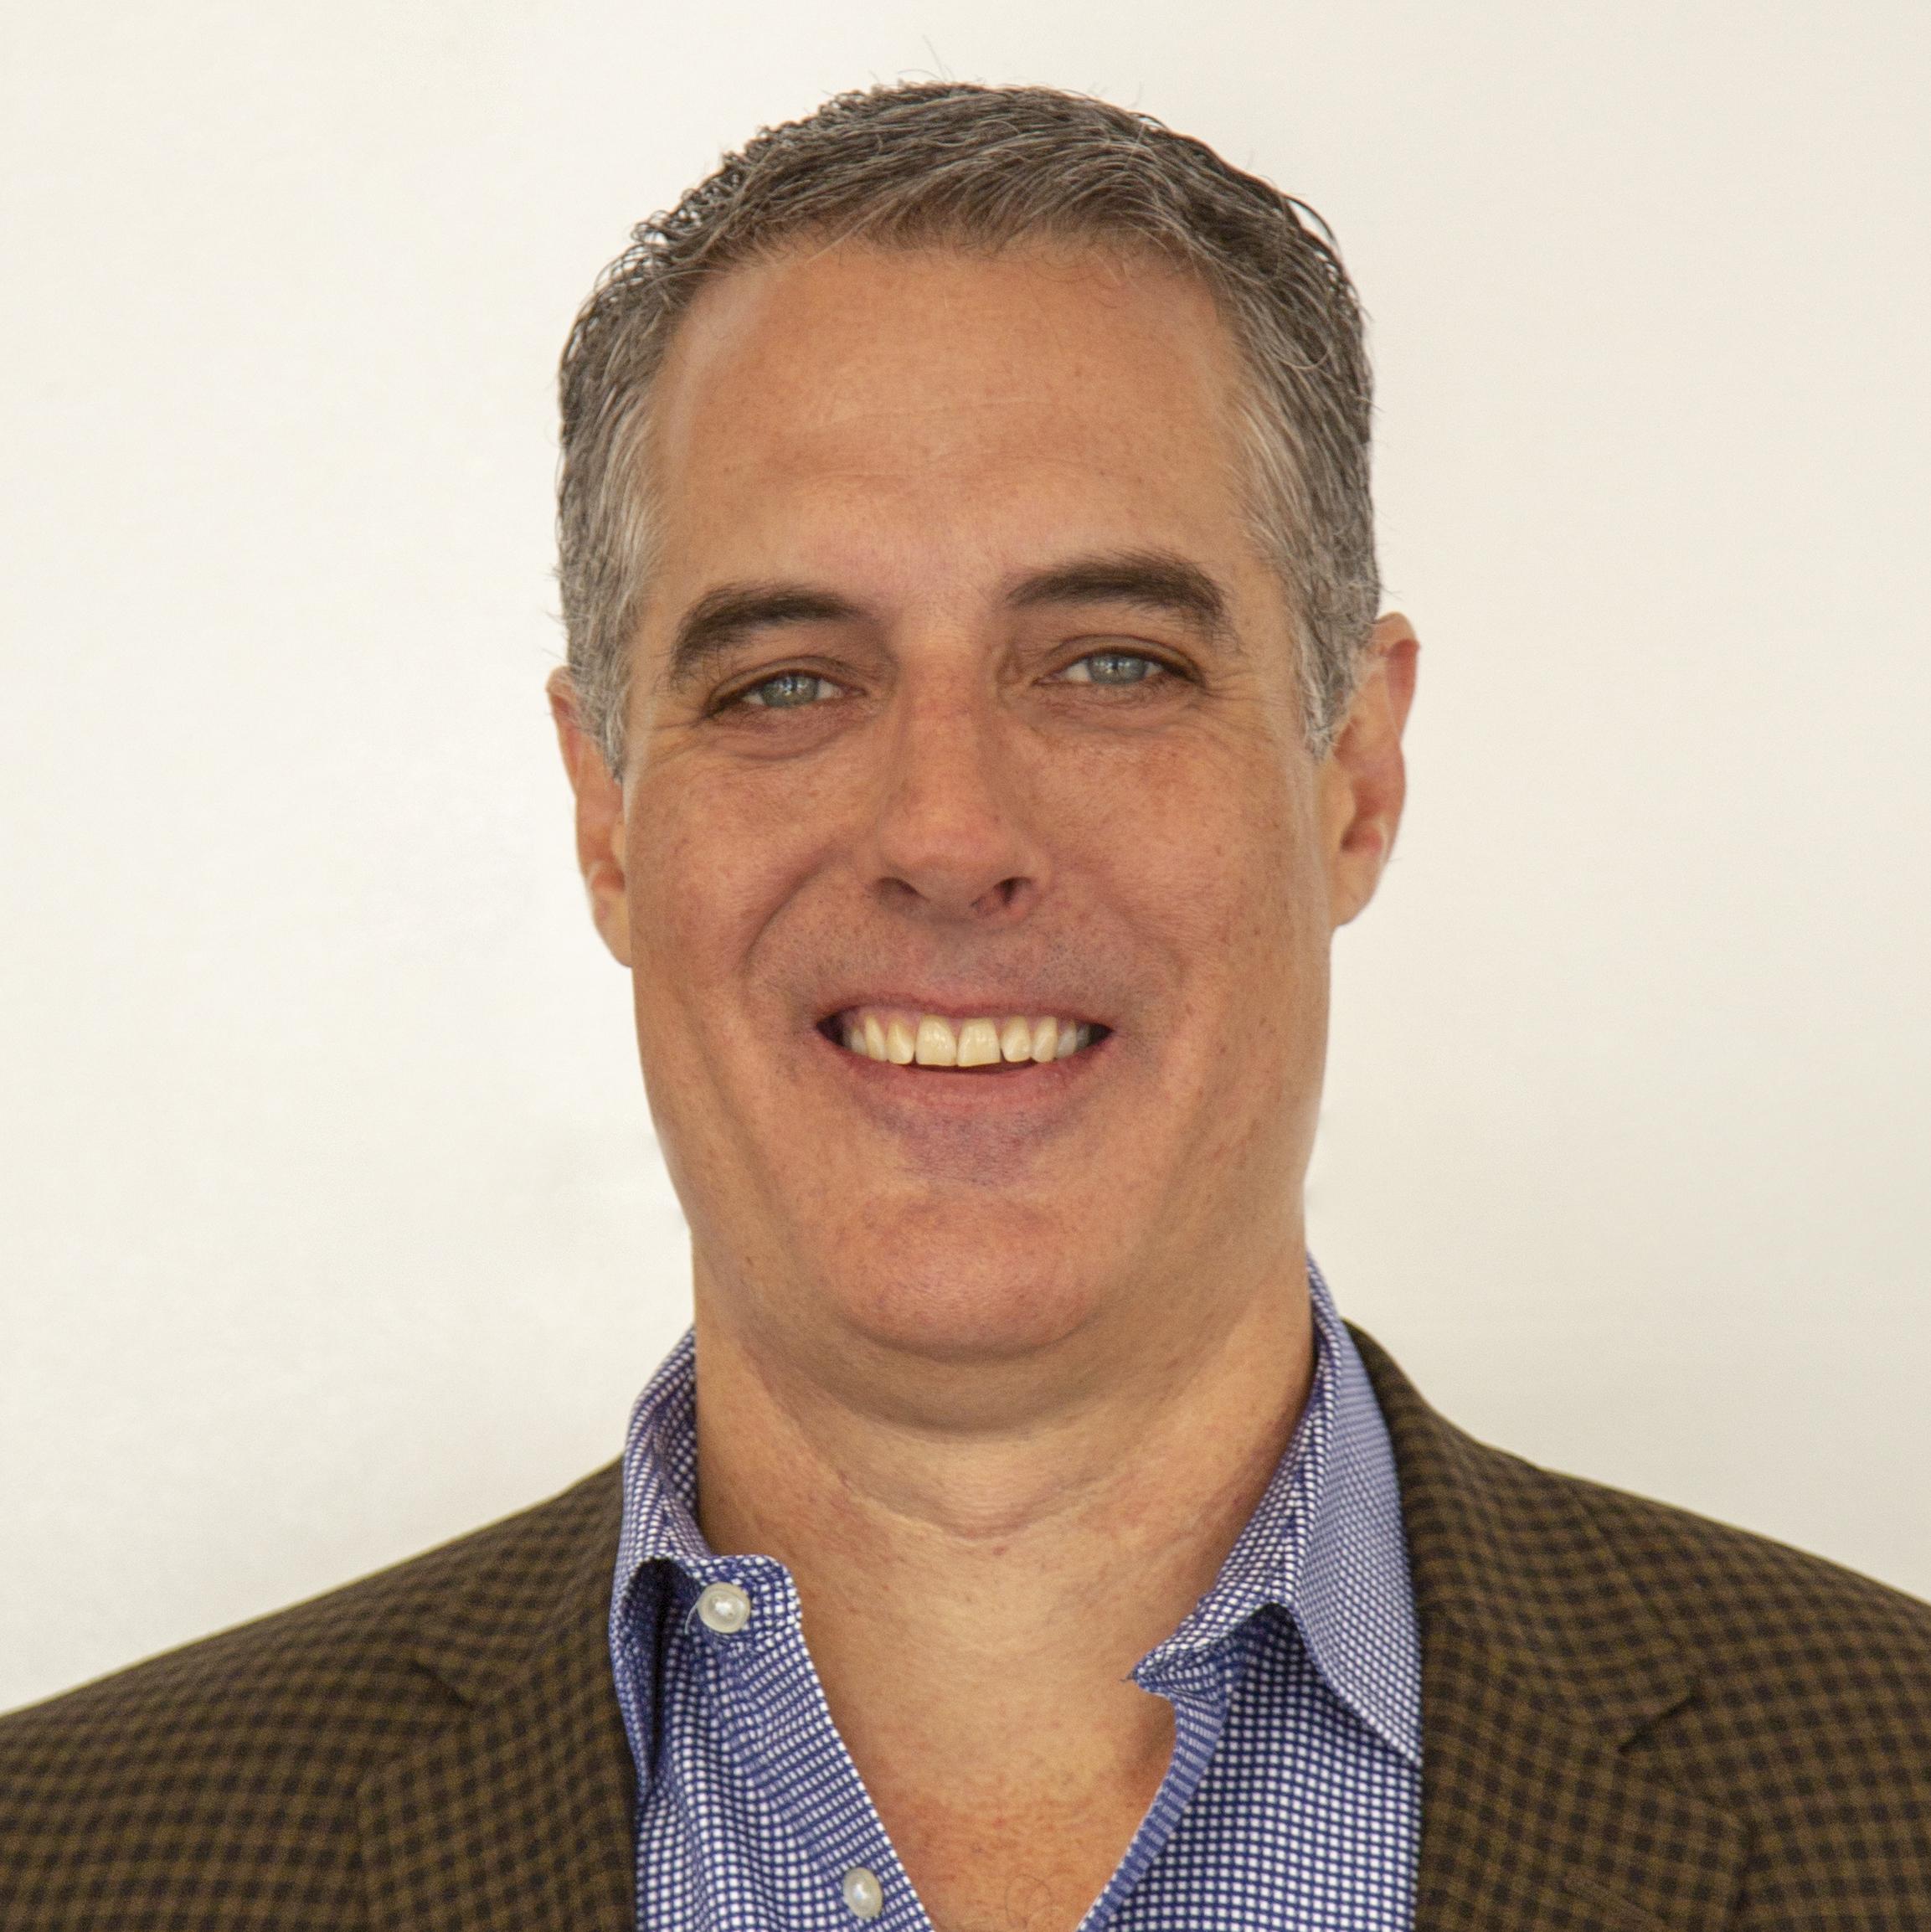 2019 IRTS Newsmaker moderator: Kris Magel